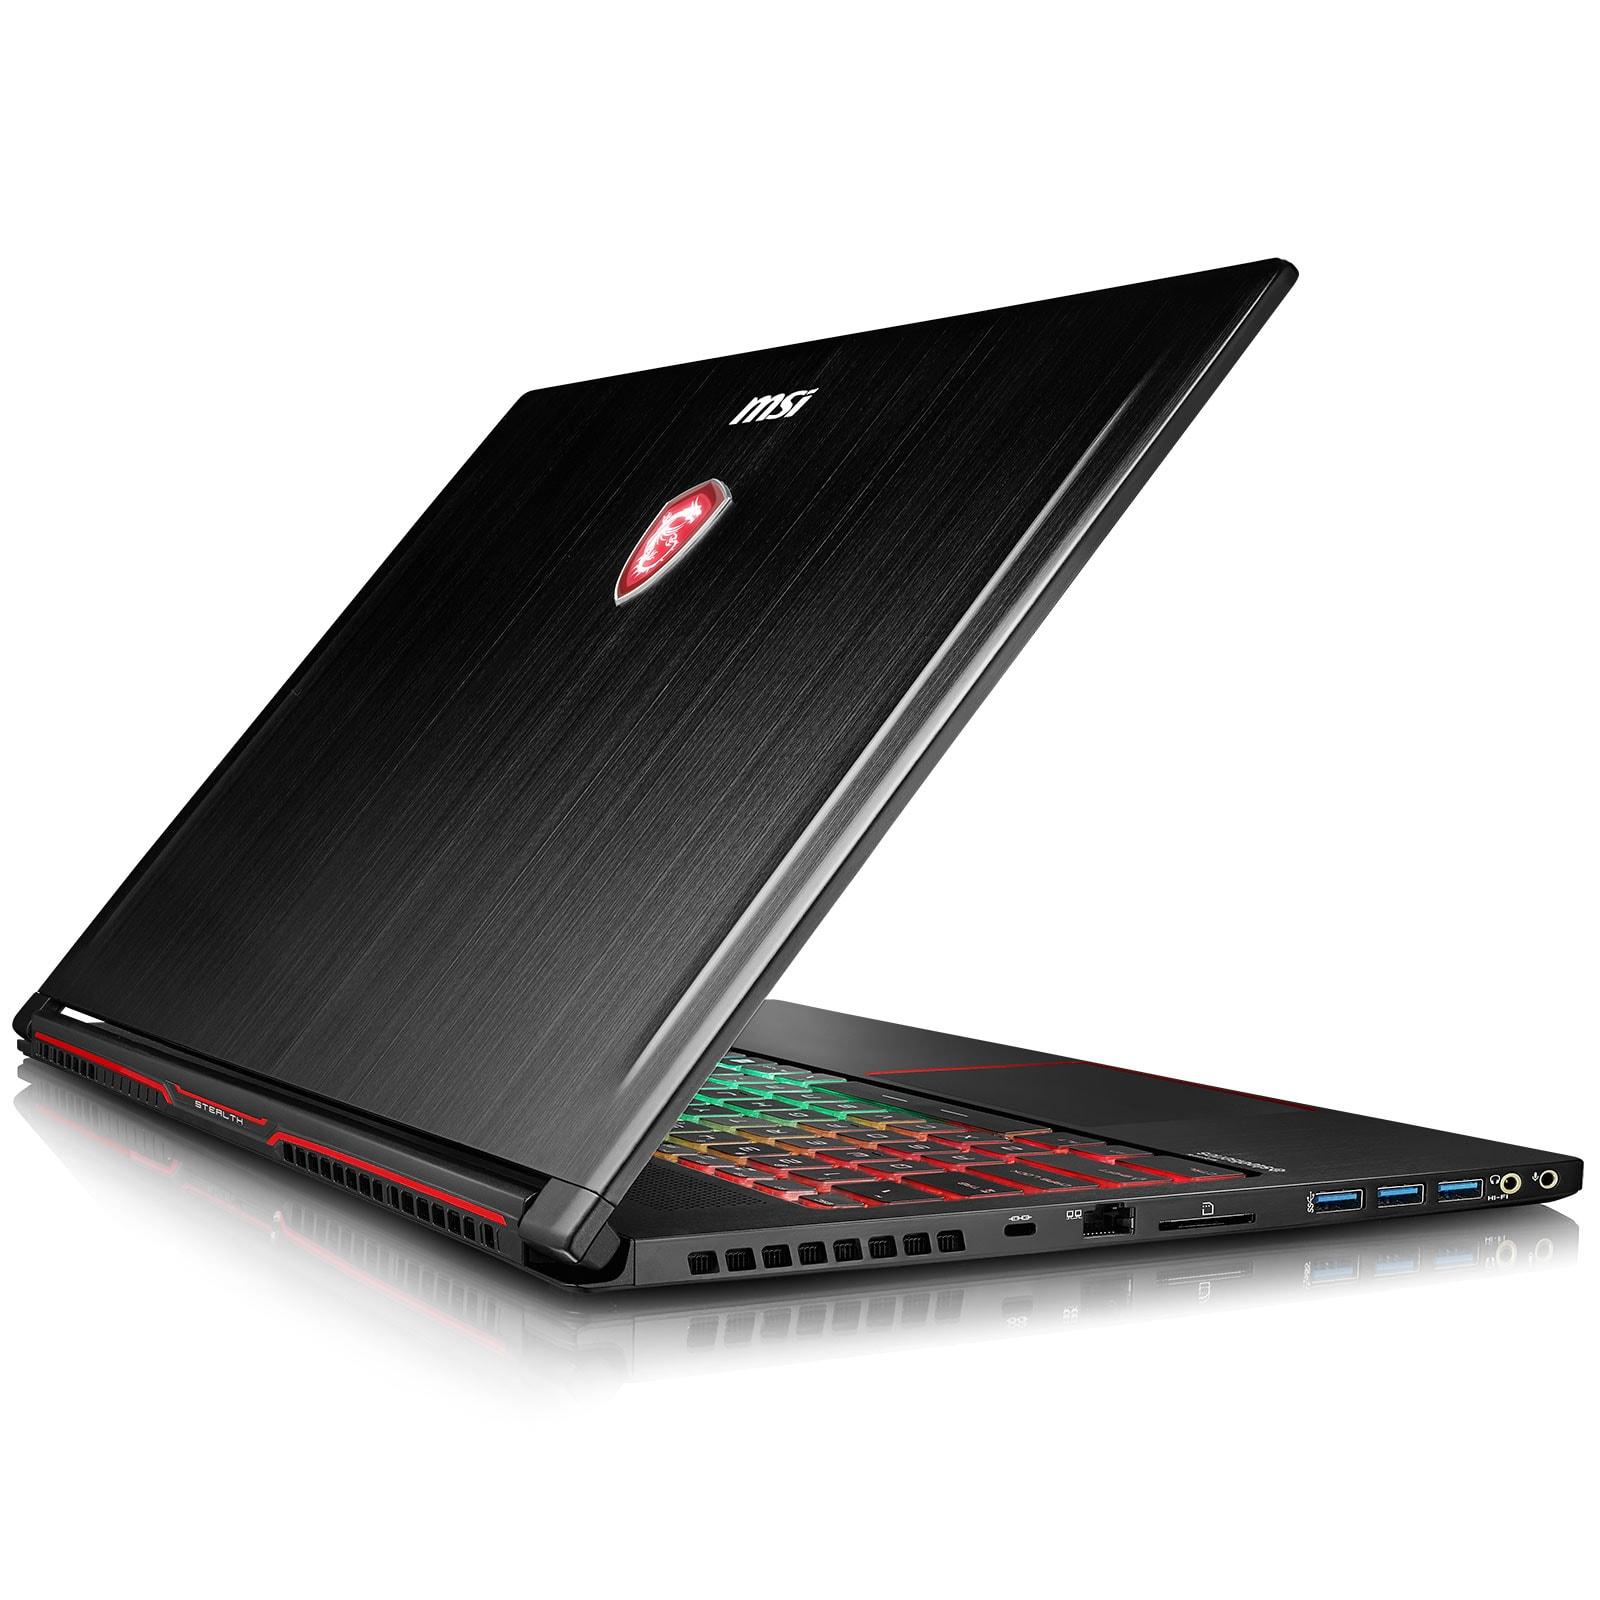 MSI GS63VR 7RG-009FR - PC portable MSI - Cybertek.fr - 1